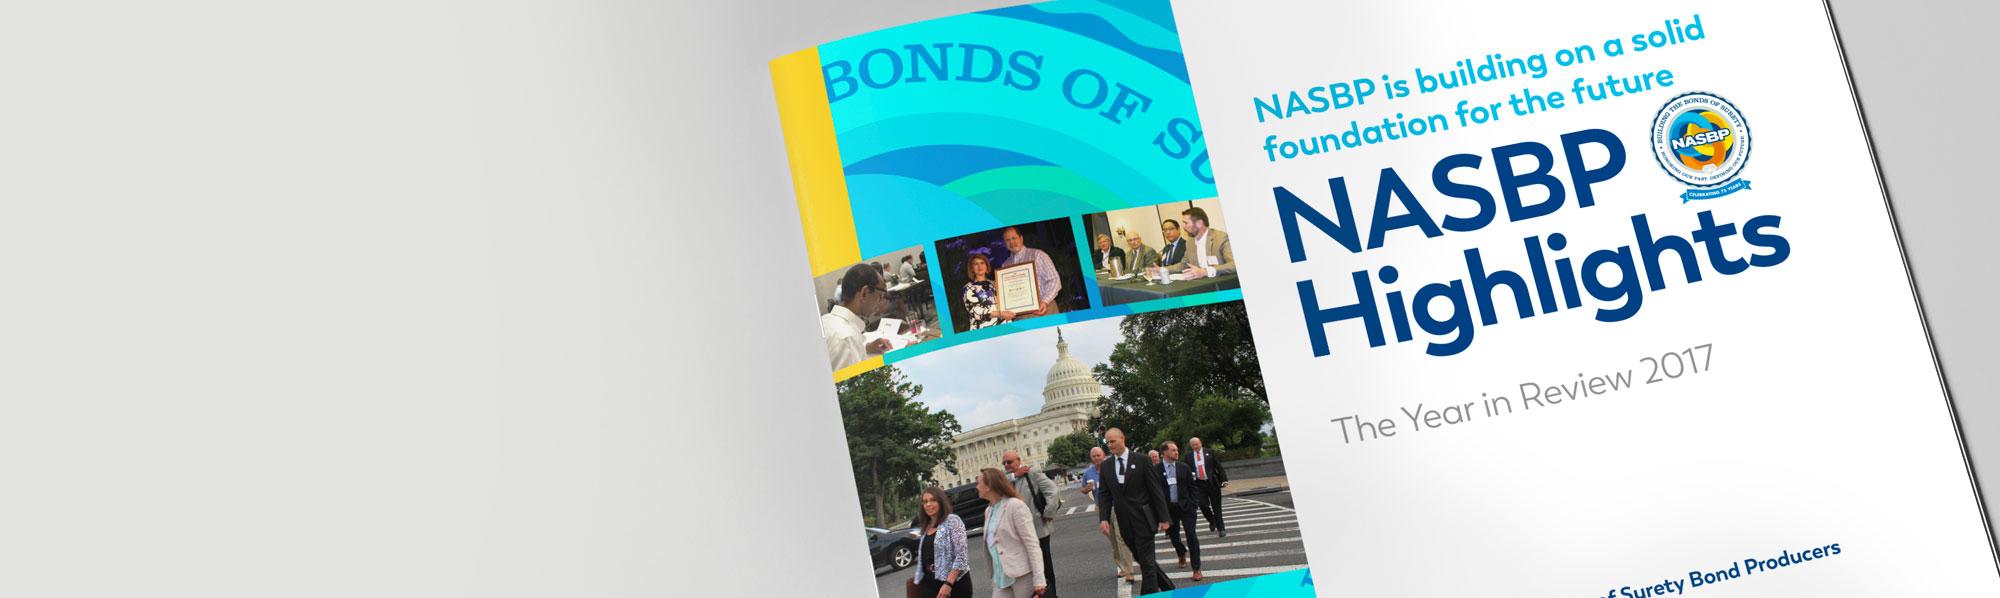 Slide-NASBP 2017 Highlights